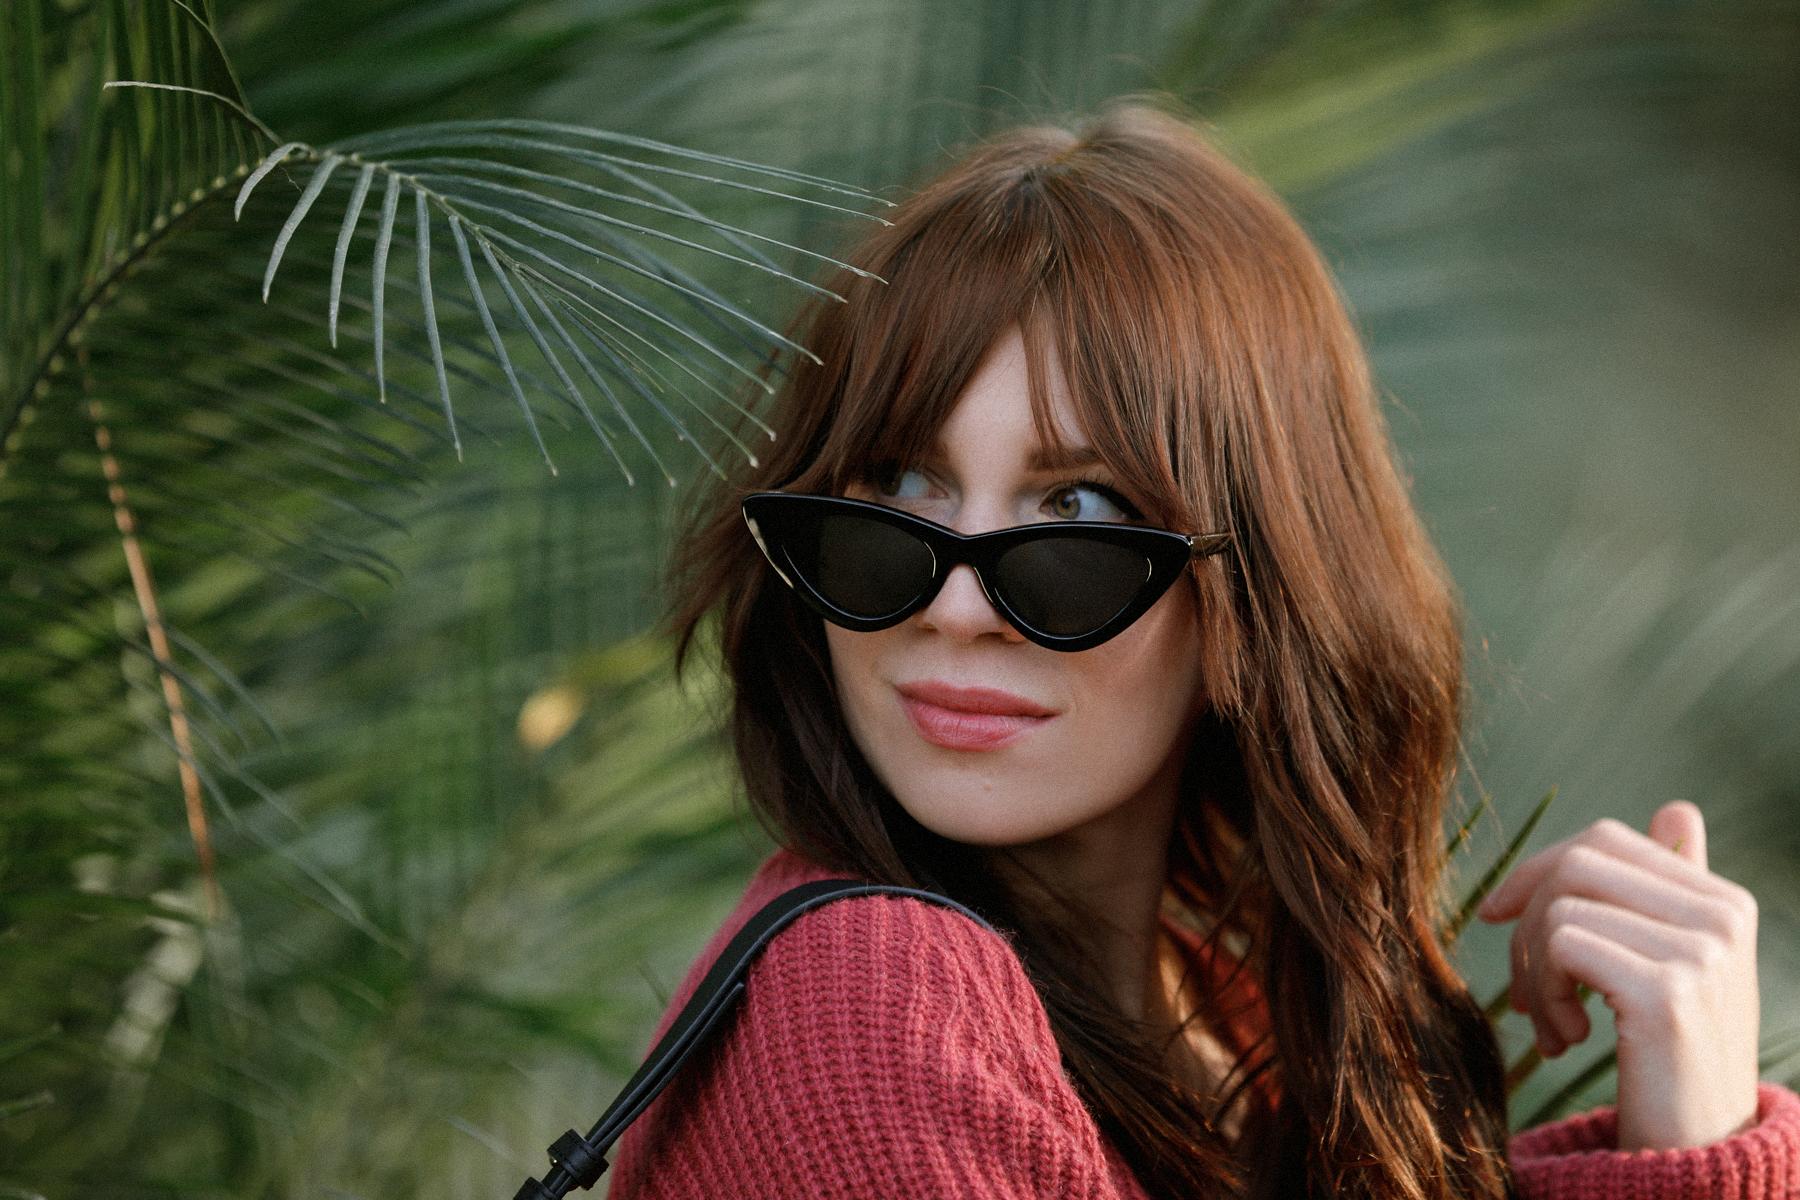 flattered flats adam selman x le specs sunglasses lolita black cat-eye sunnies catsanddogsblog modeblogger fashionblog dusseldorf germany berlin bloggers styleblogger ricarda schernus max bechmann fotografie film 2